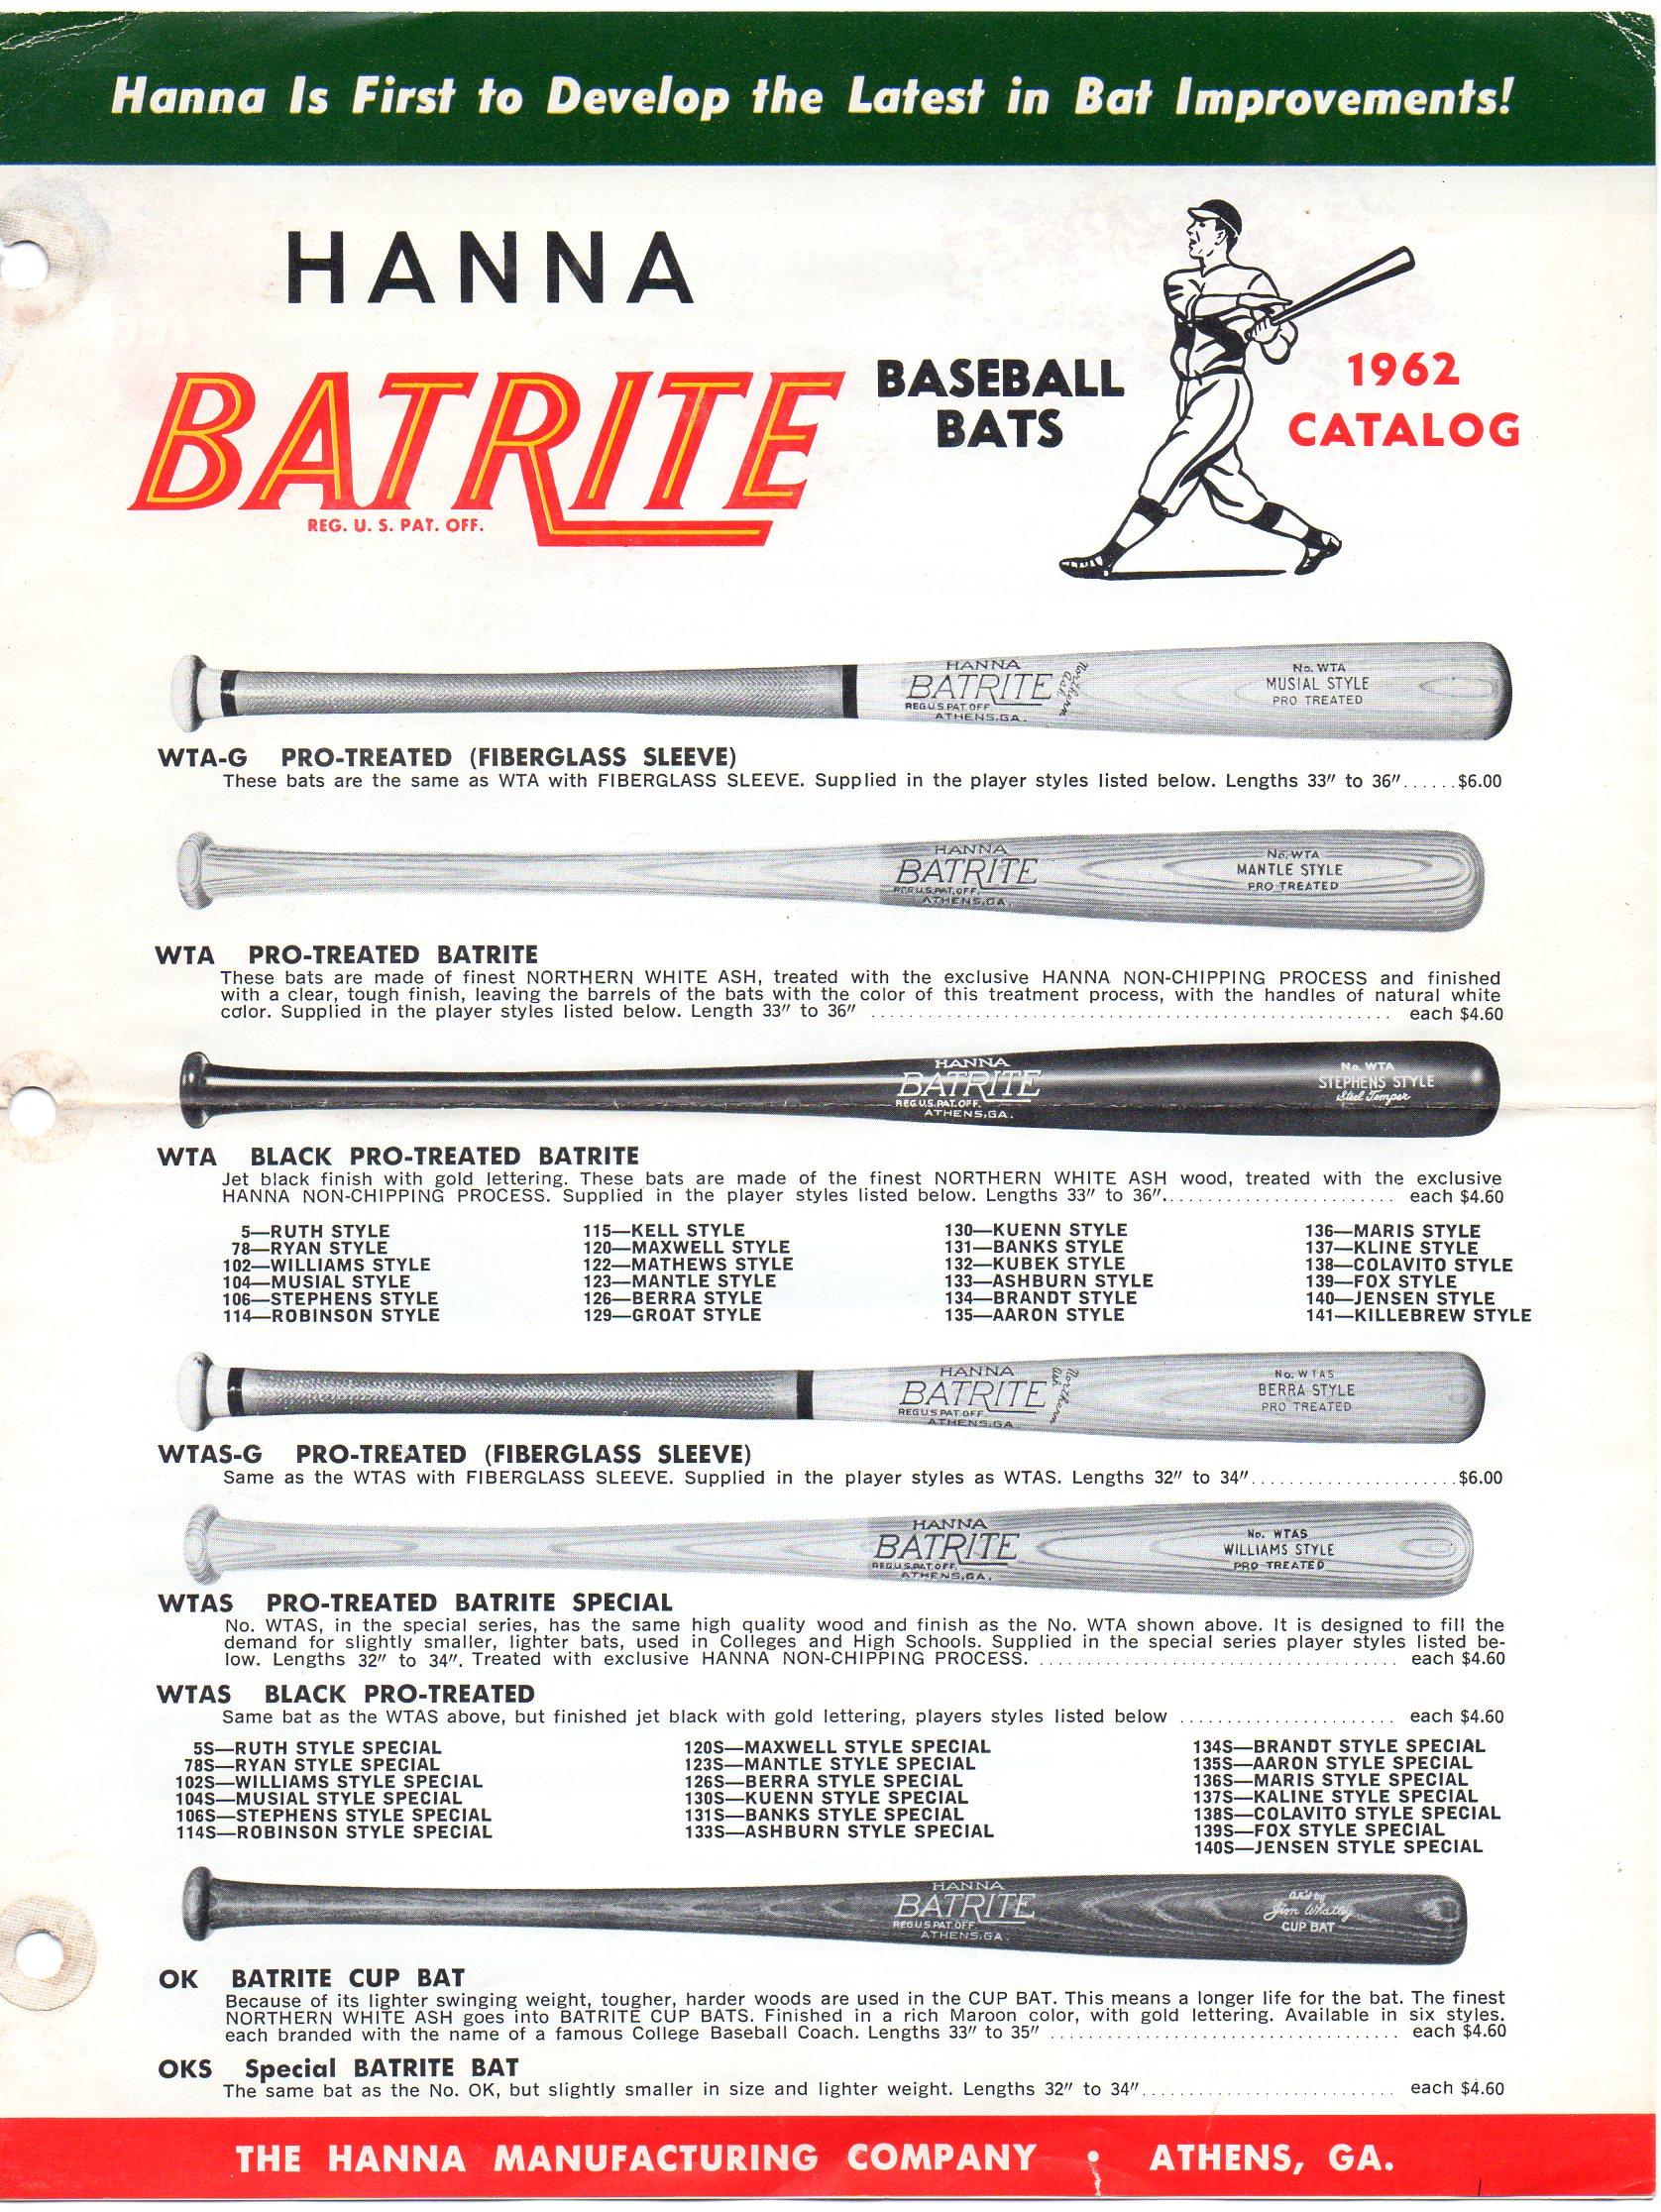 1962 hanna-batrite catalog